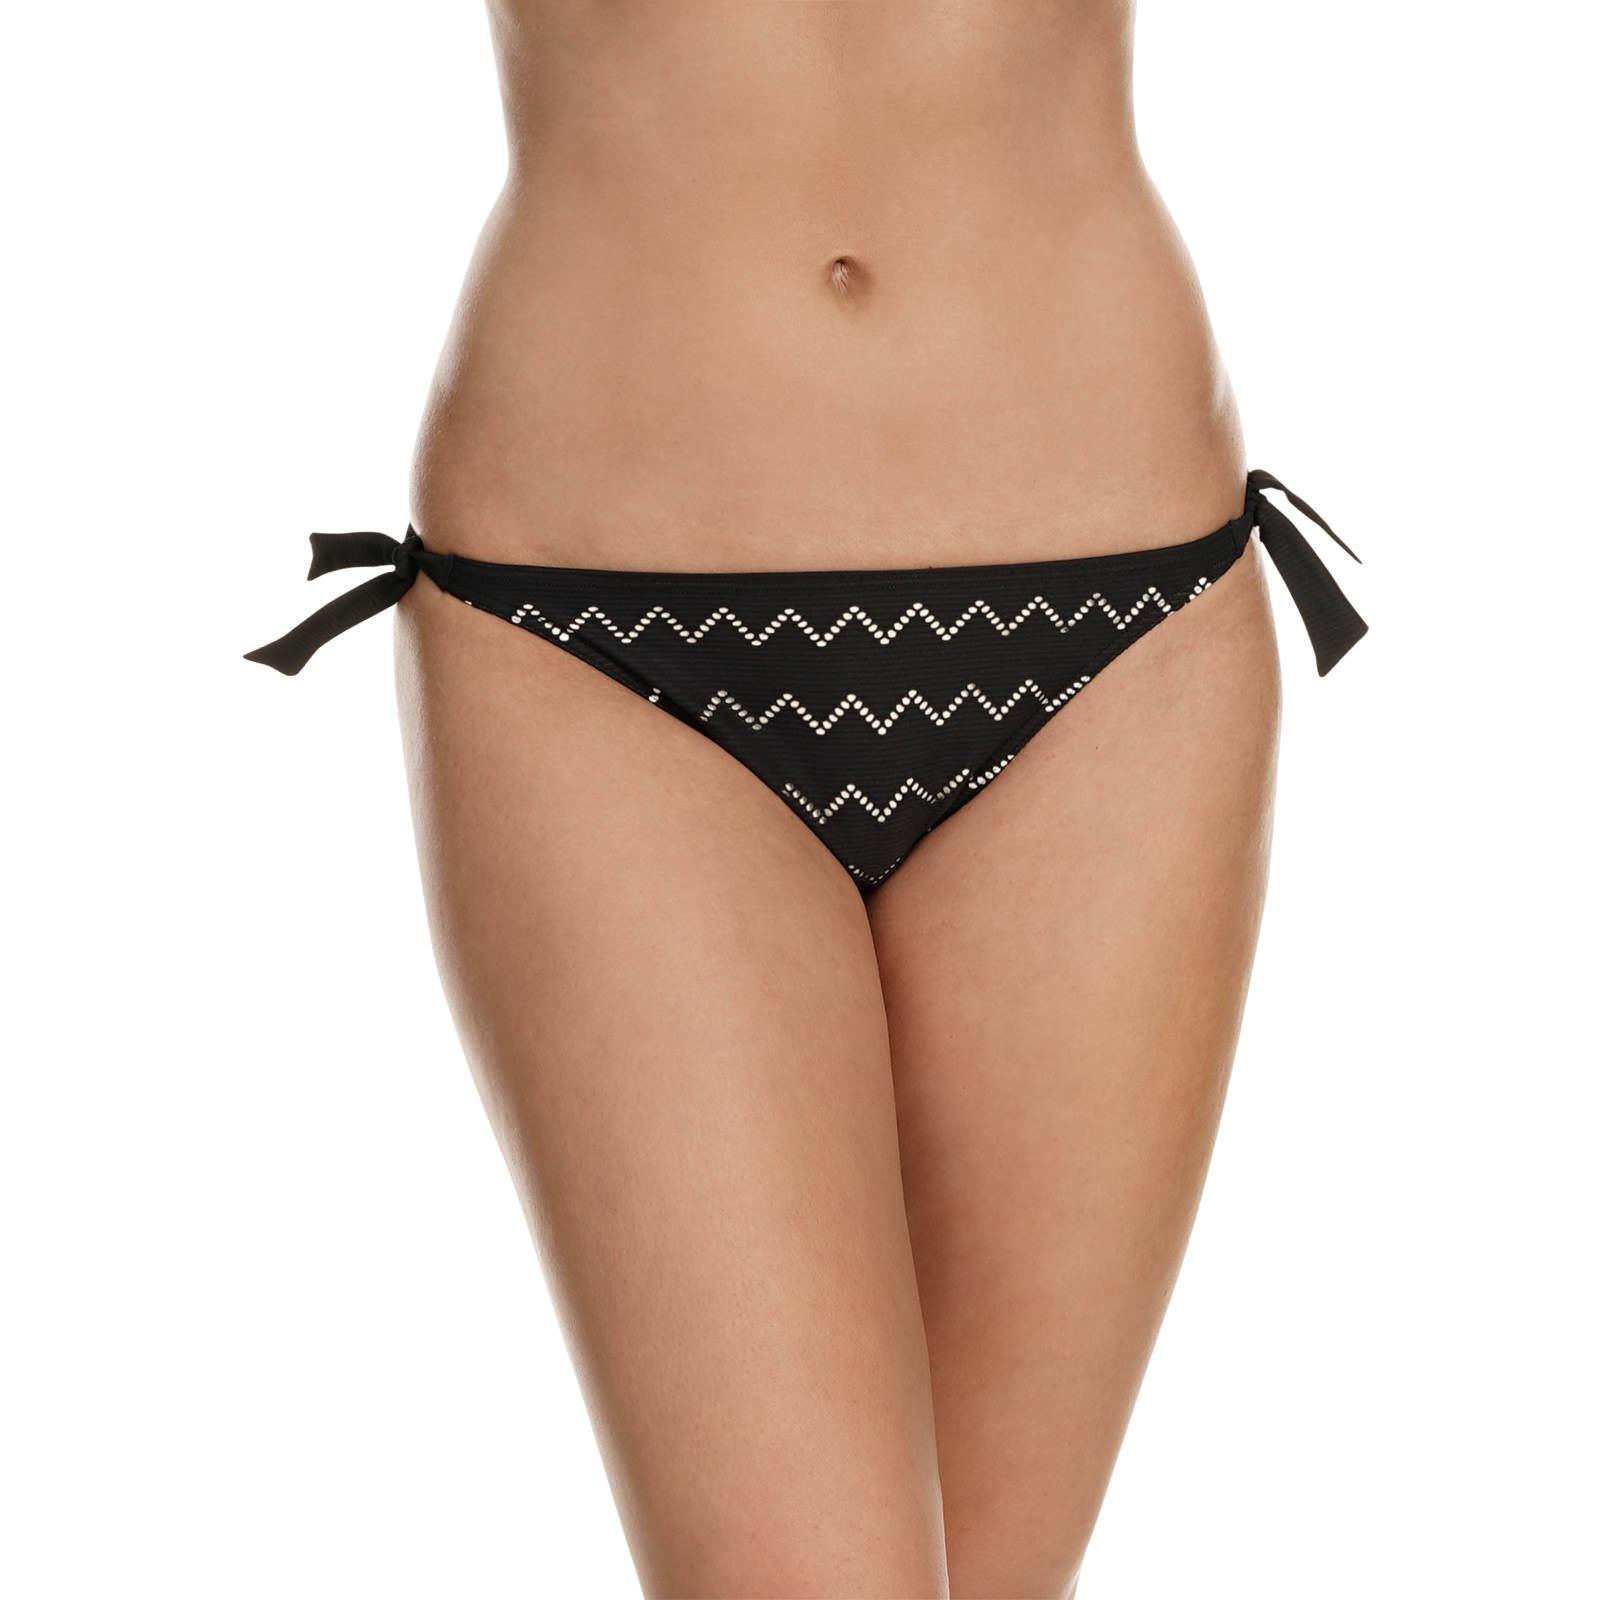 bikini unterteil maya in schwarz bademode bikini. Black Bedroom Furniture Sets. Home Design Ideas